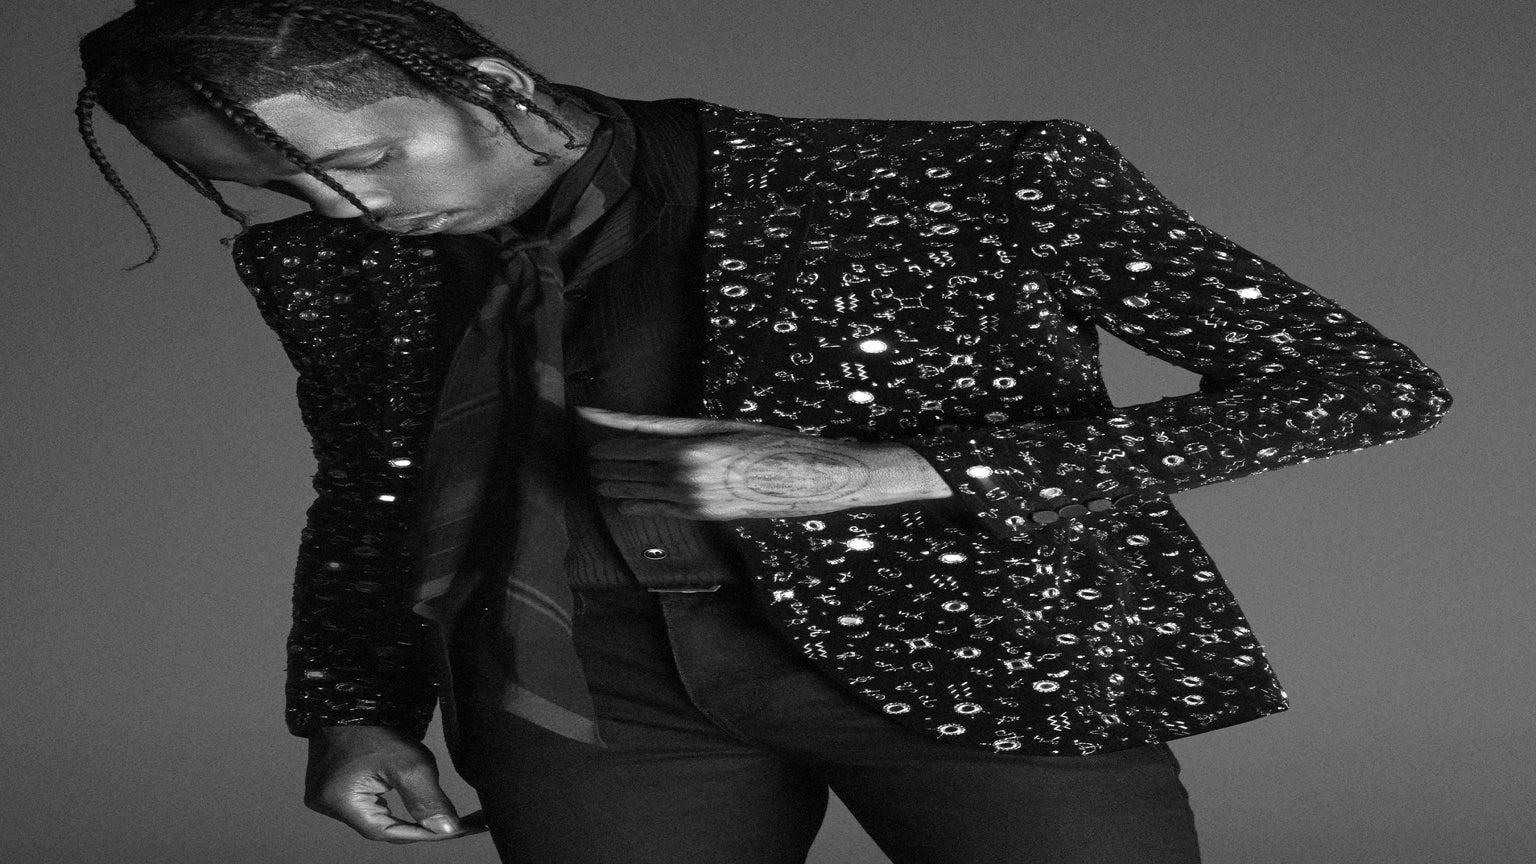 Travis Scott Reprises His Role As A Male Model In New YSL Campaign